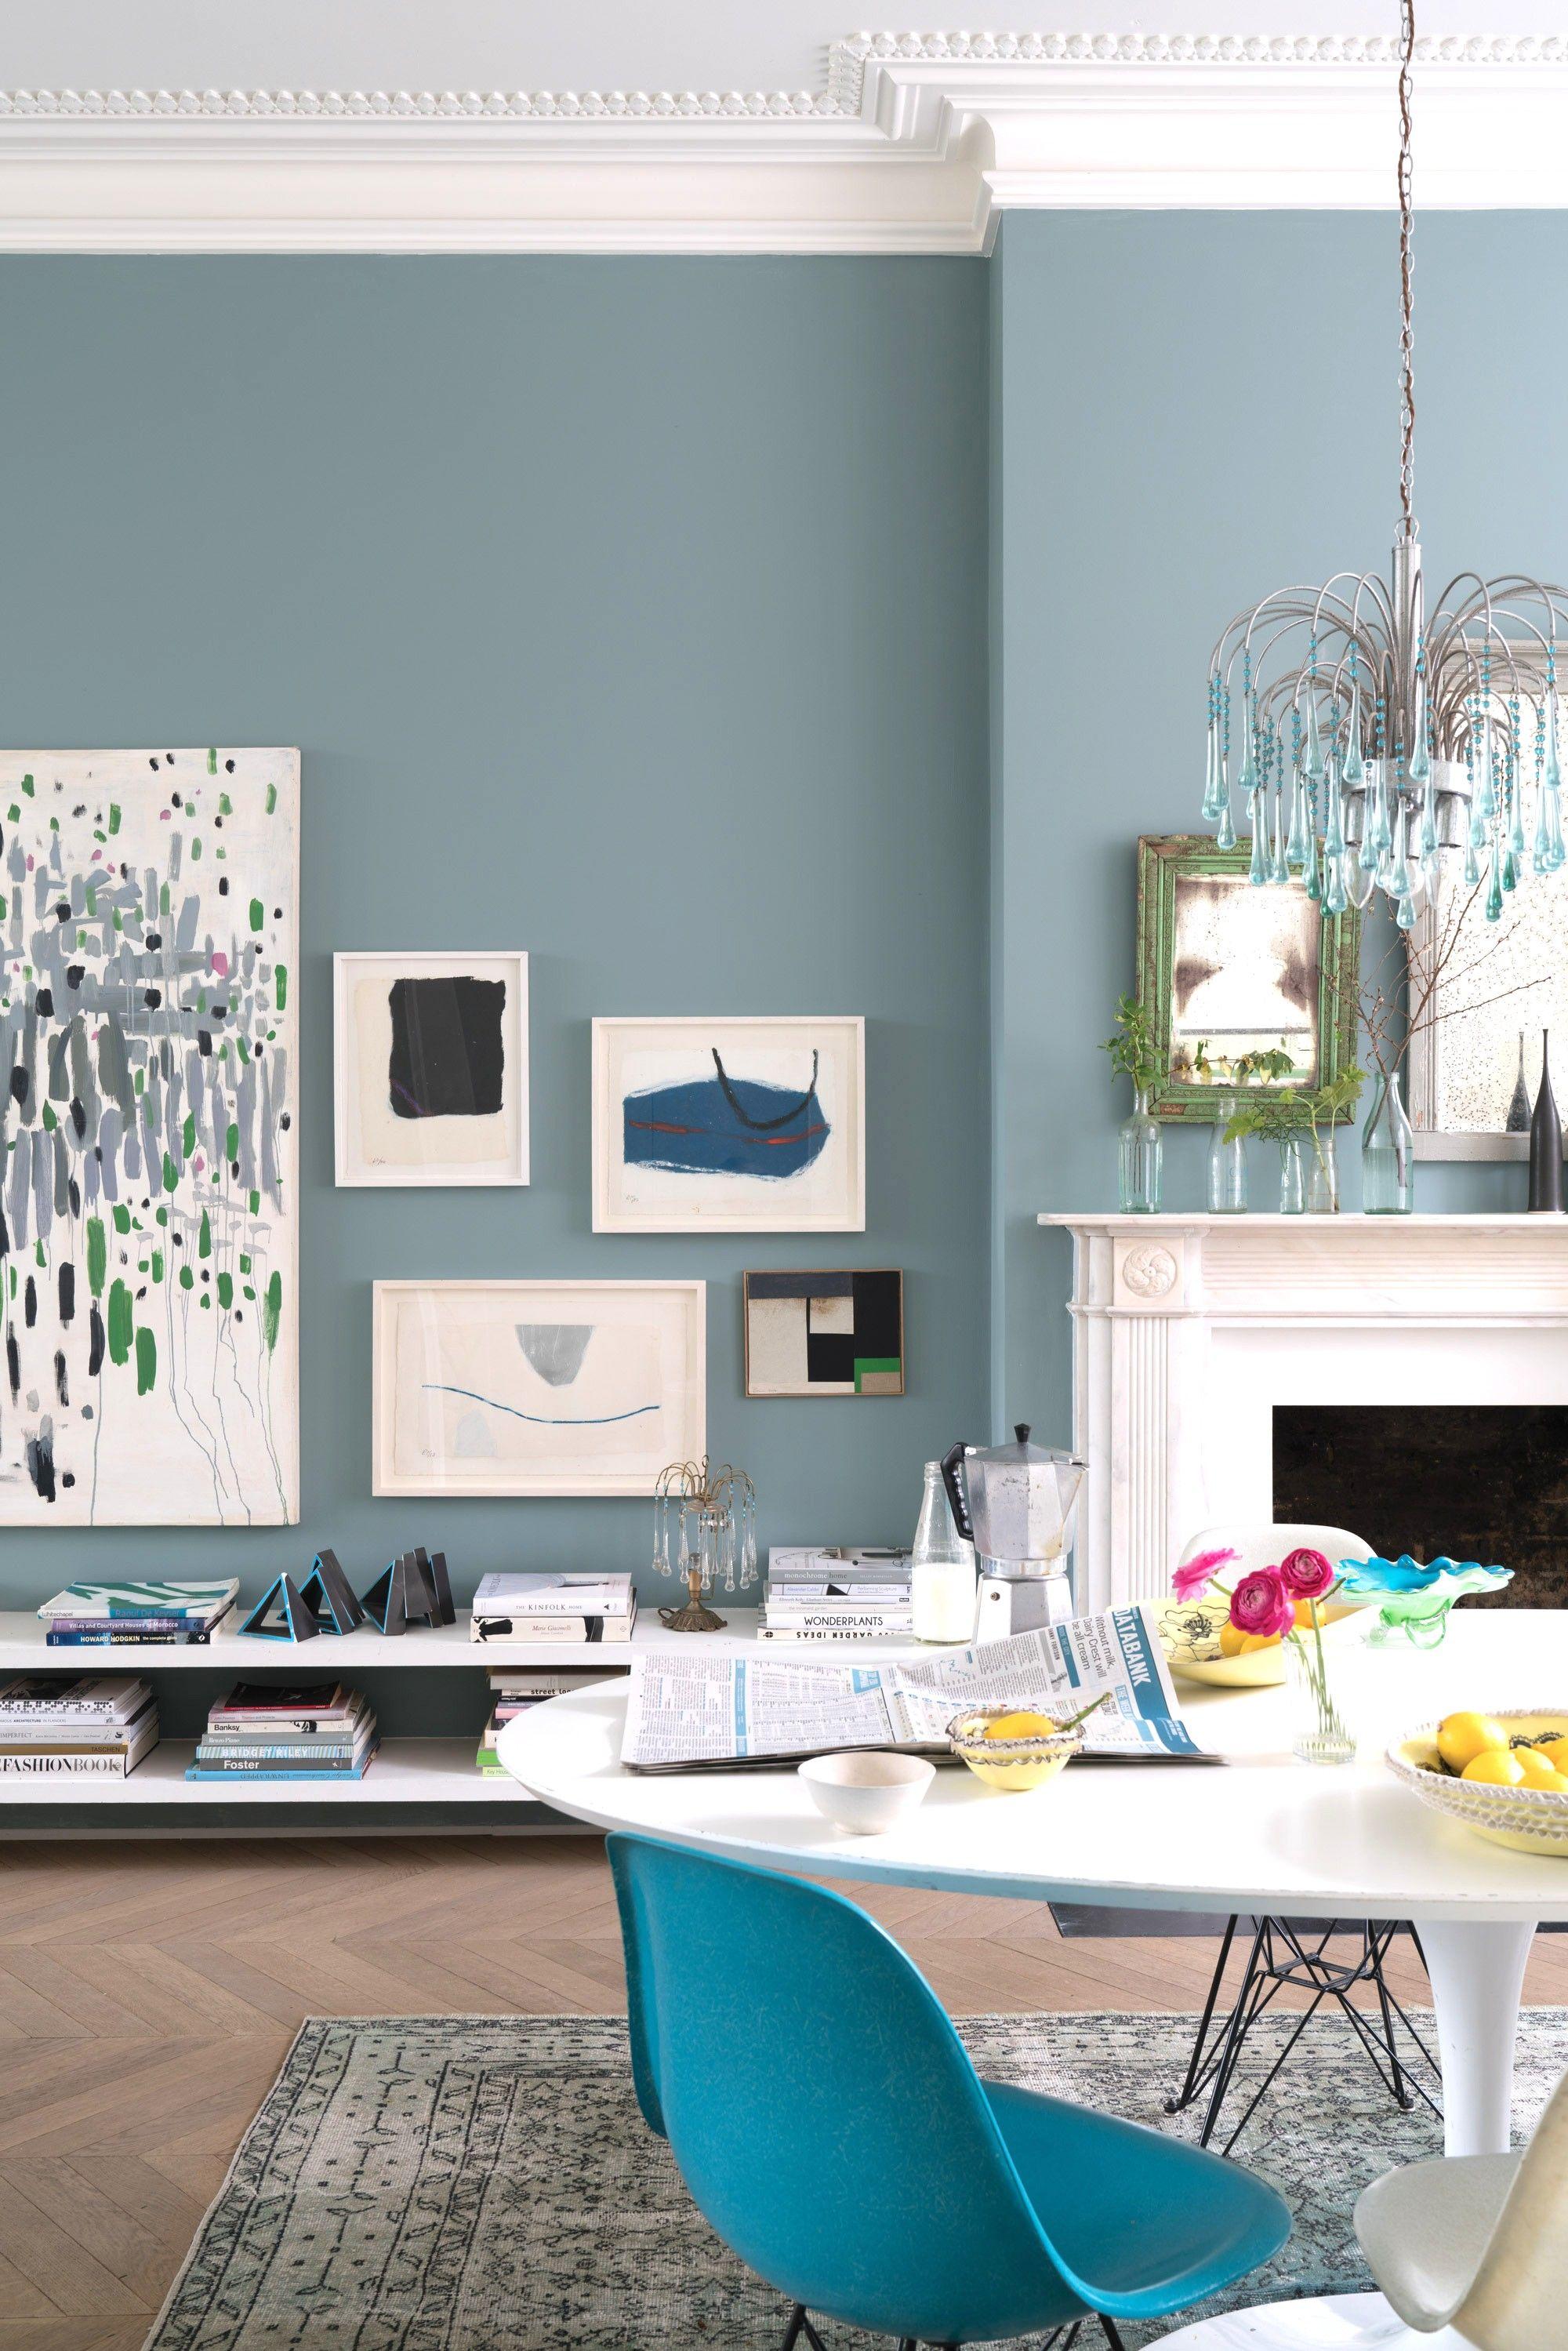 Farrow And Ball Farben Innenraumfarben Wohnzimmer Set Wandfarbe Wohnzimmer